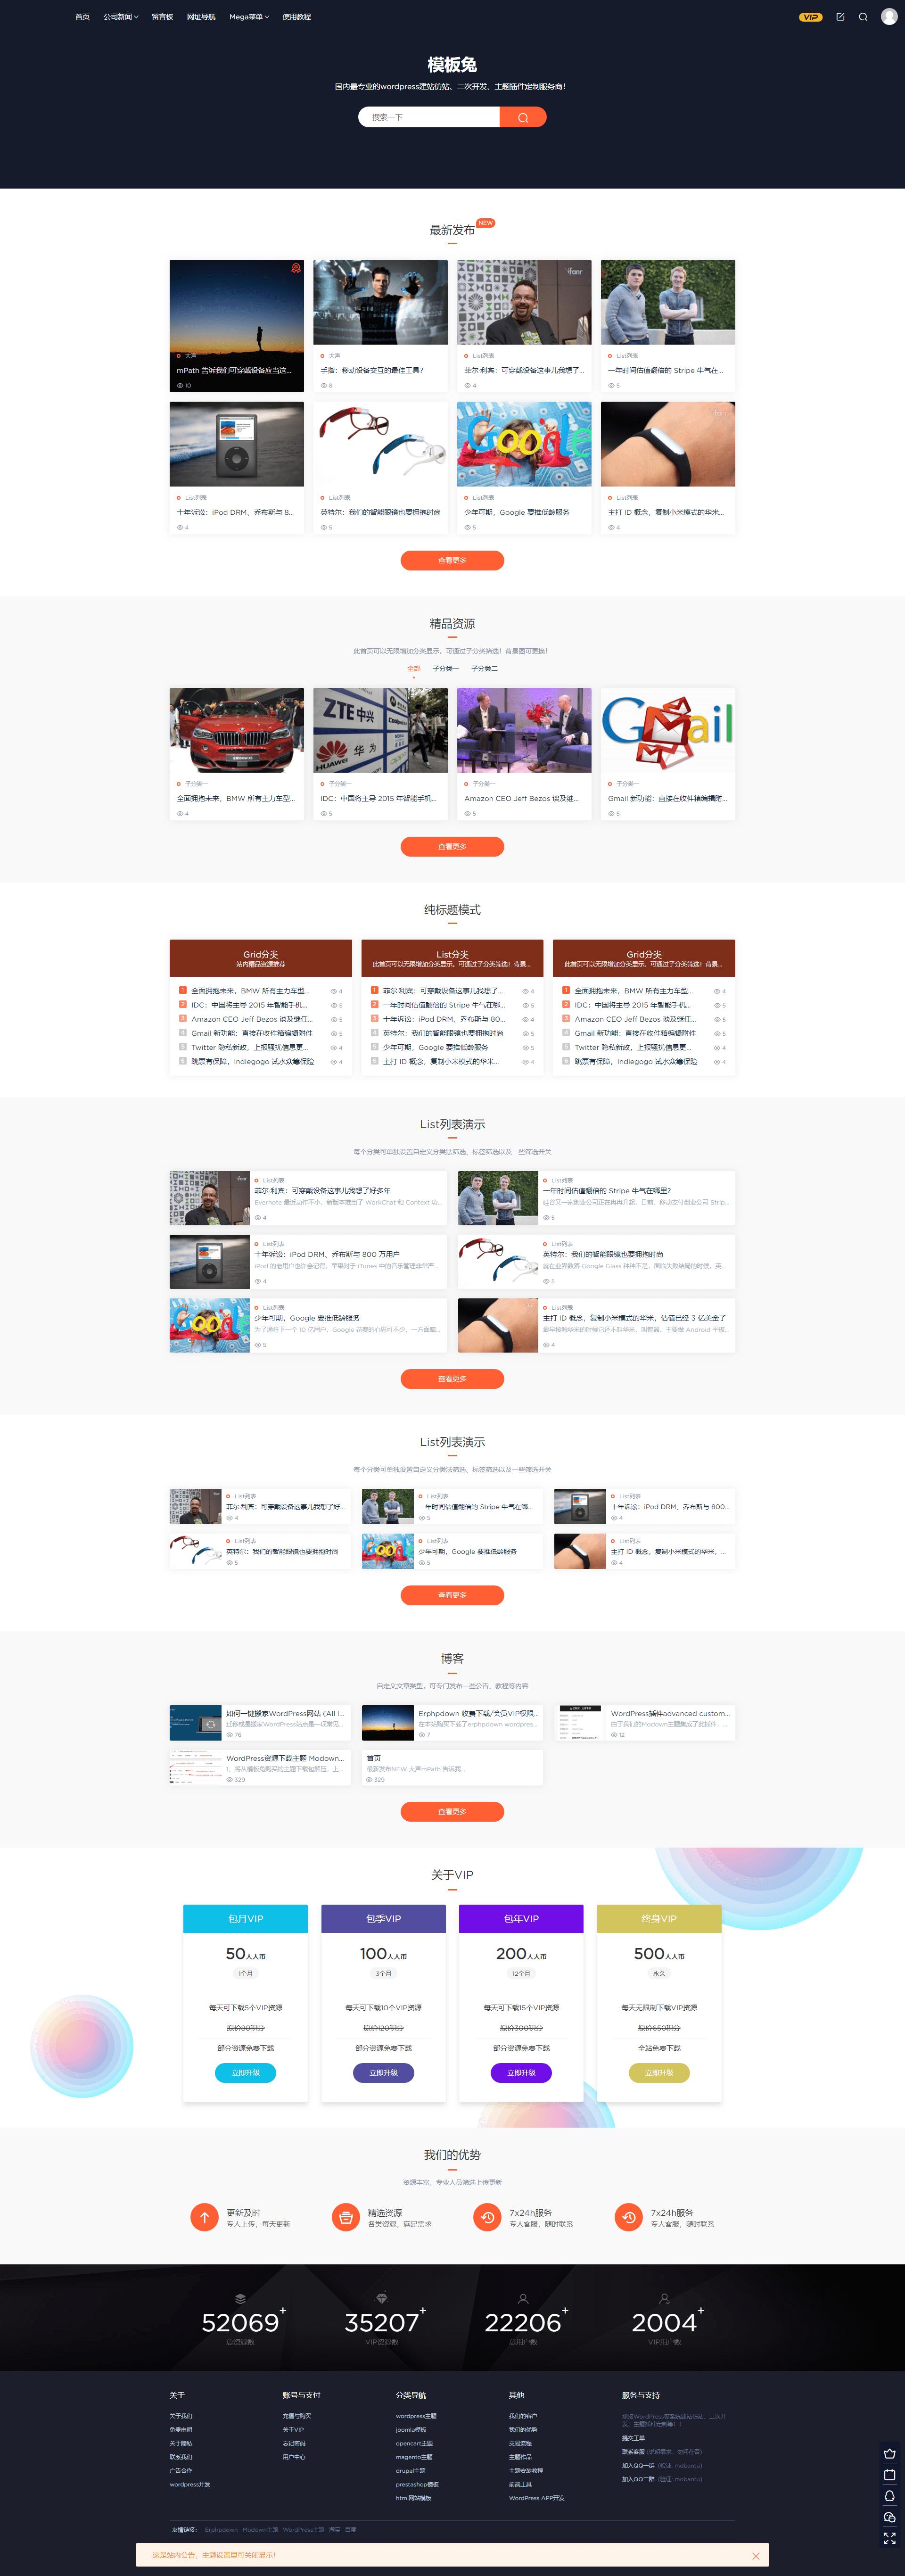 WordPress主题Modown4.3+Erphpdown10.3插件 附教程带整站